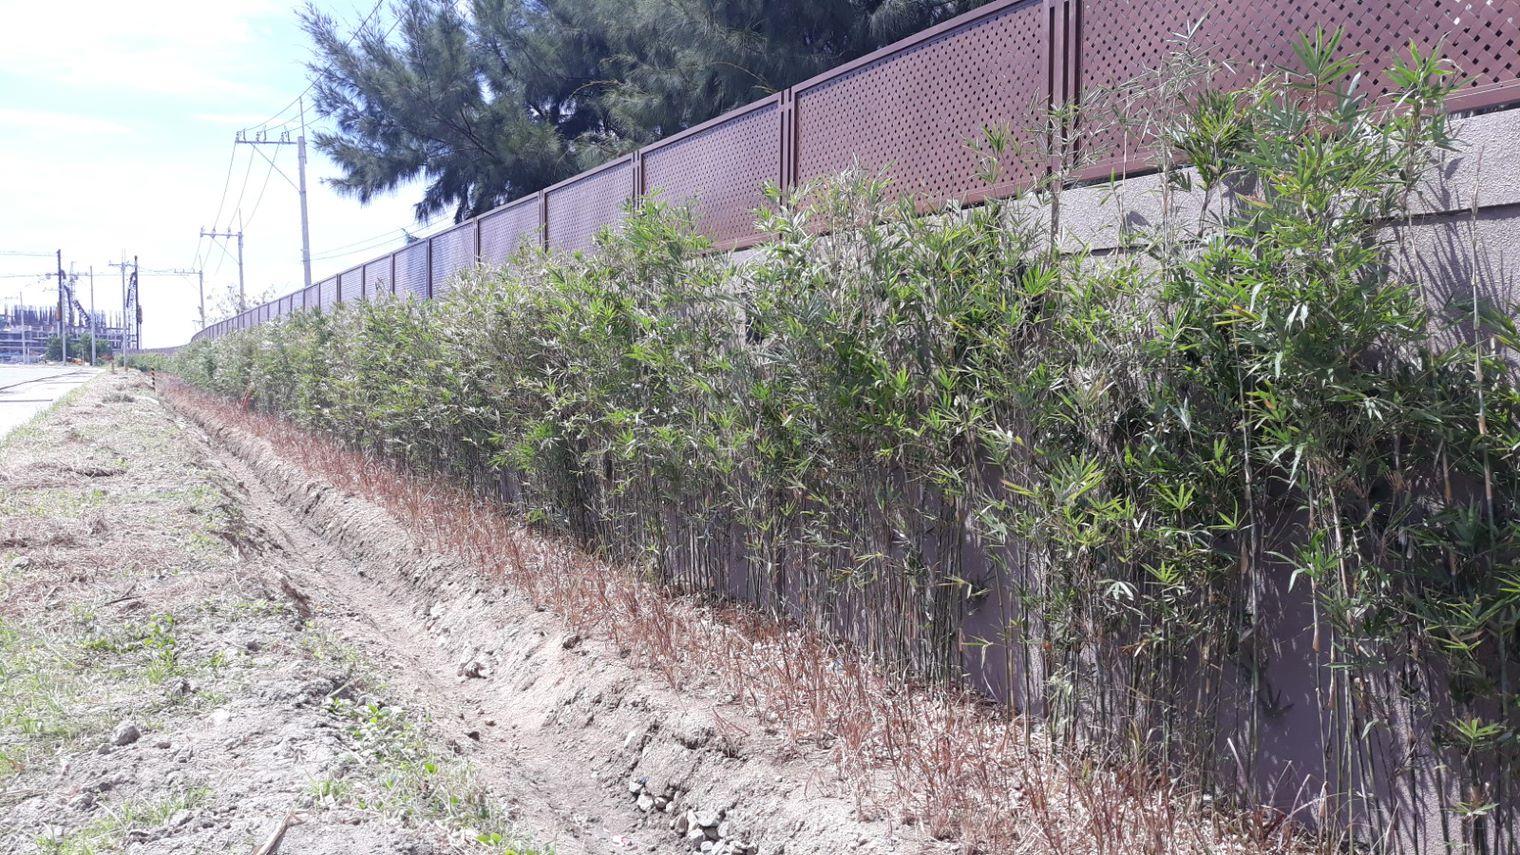 Phase 2 Perimeter Wall